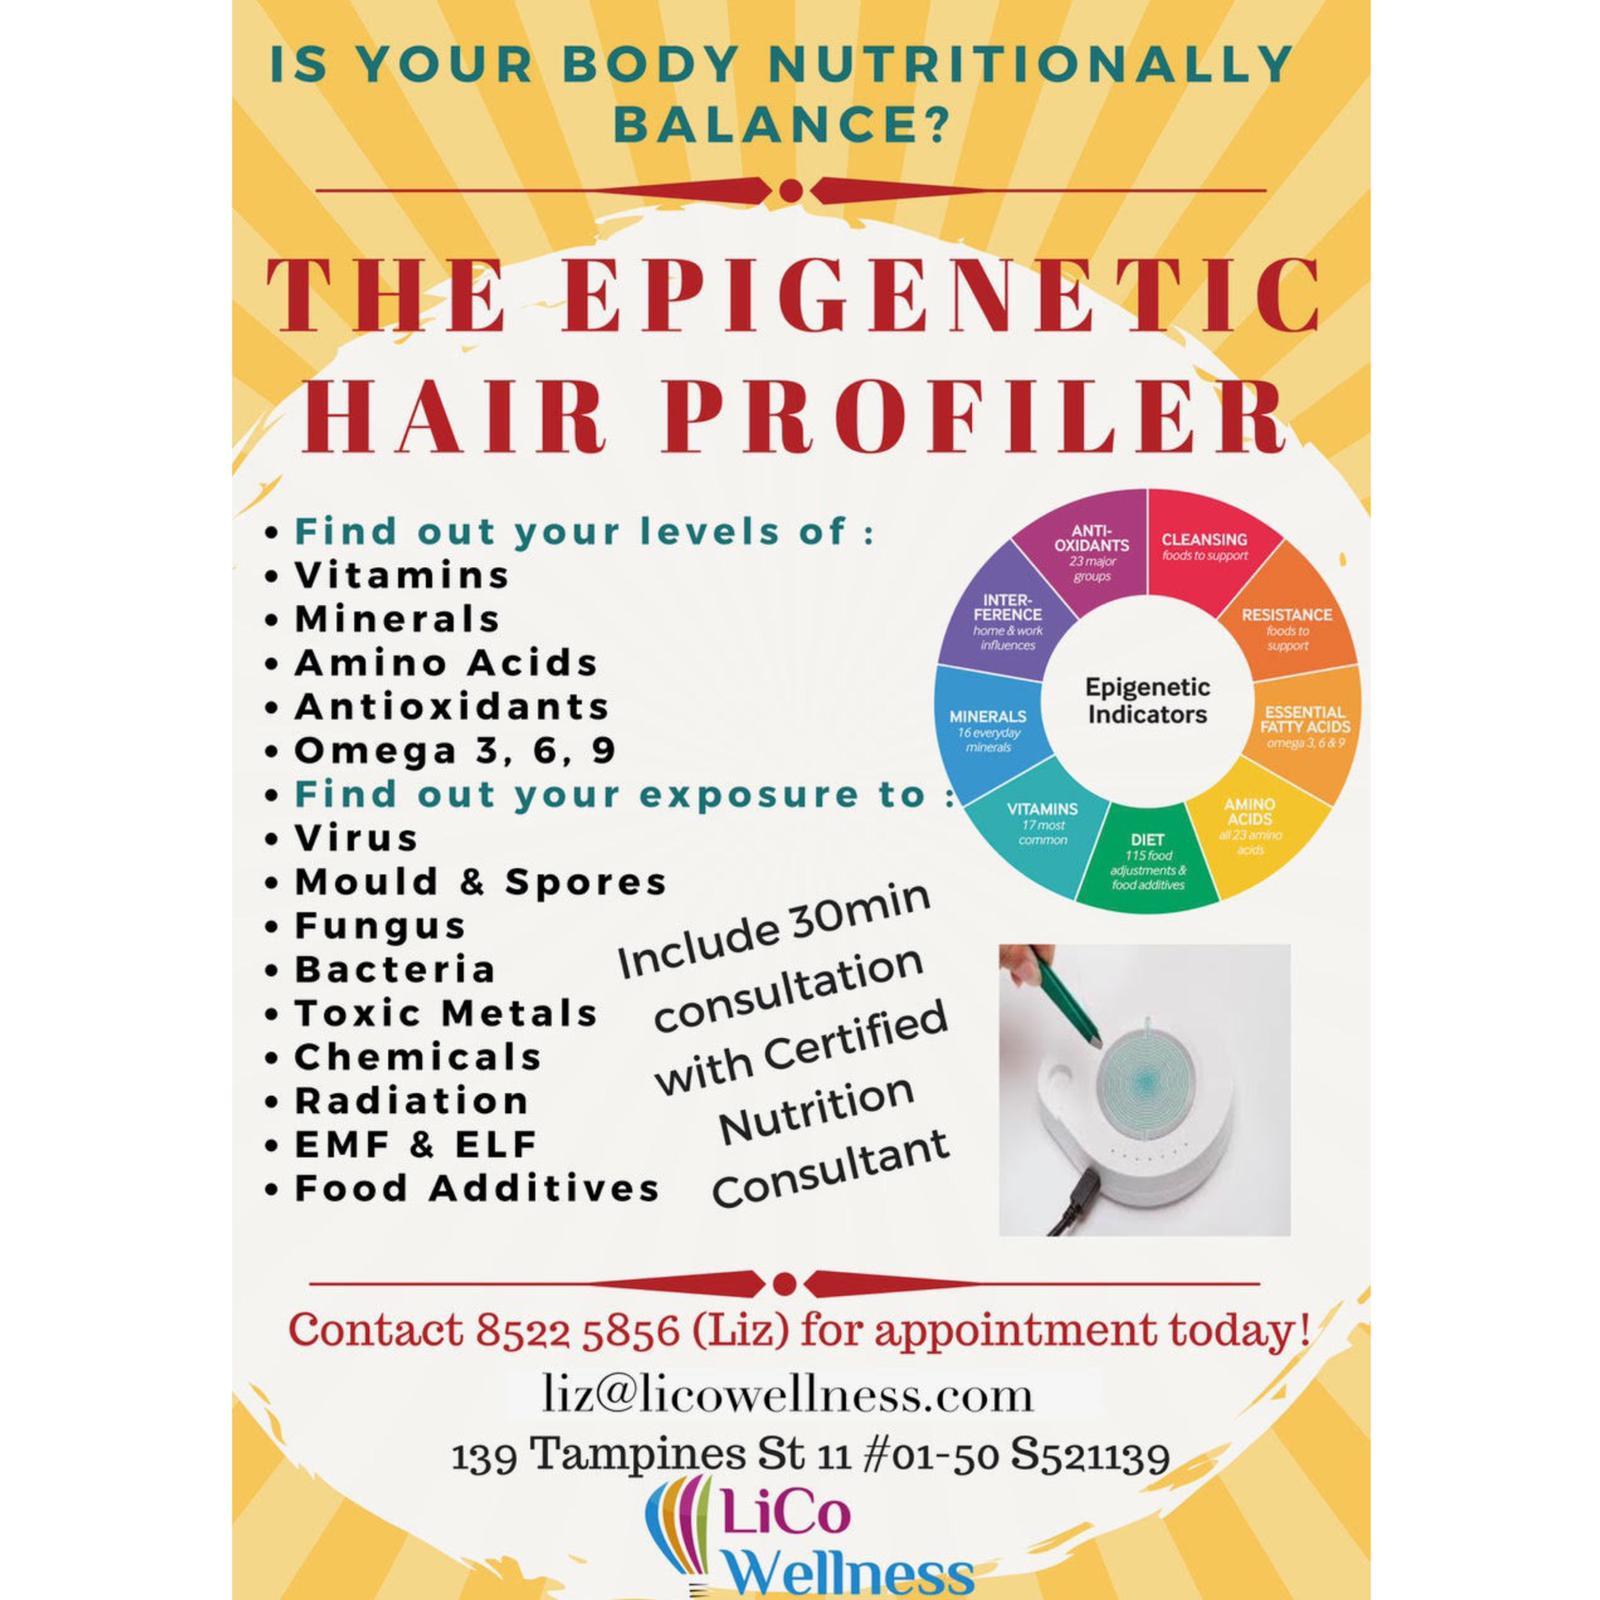 Epigenetic Hair Profiler Test & Analysis